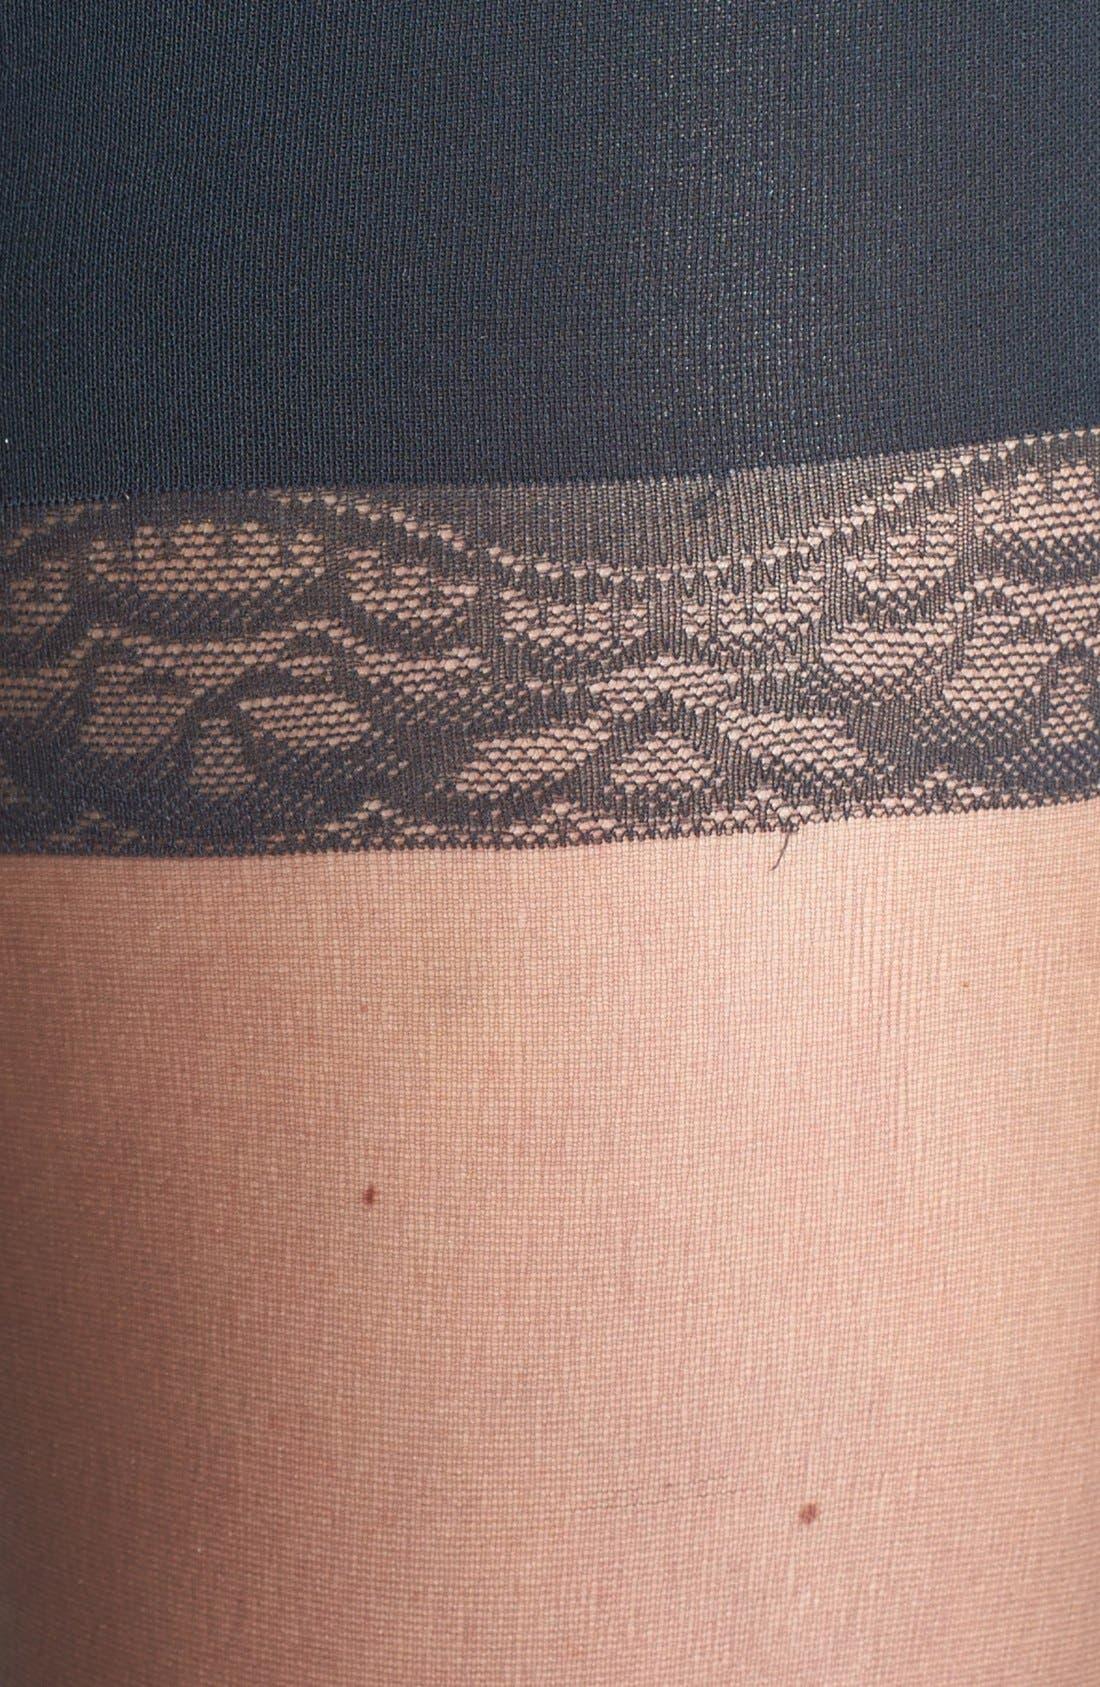 Donna Karan The Nudes Pantyhose,                             Alternate thumbnail 3, color,                             CHARCOAL